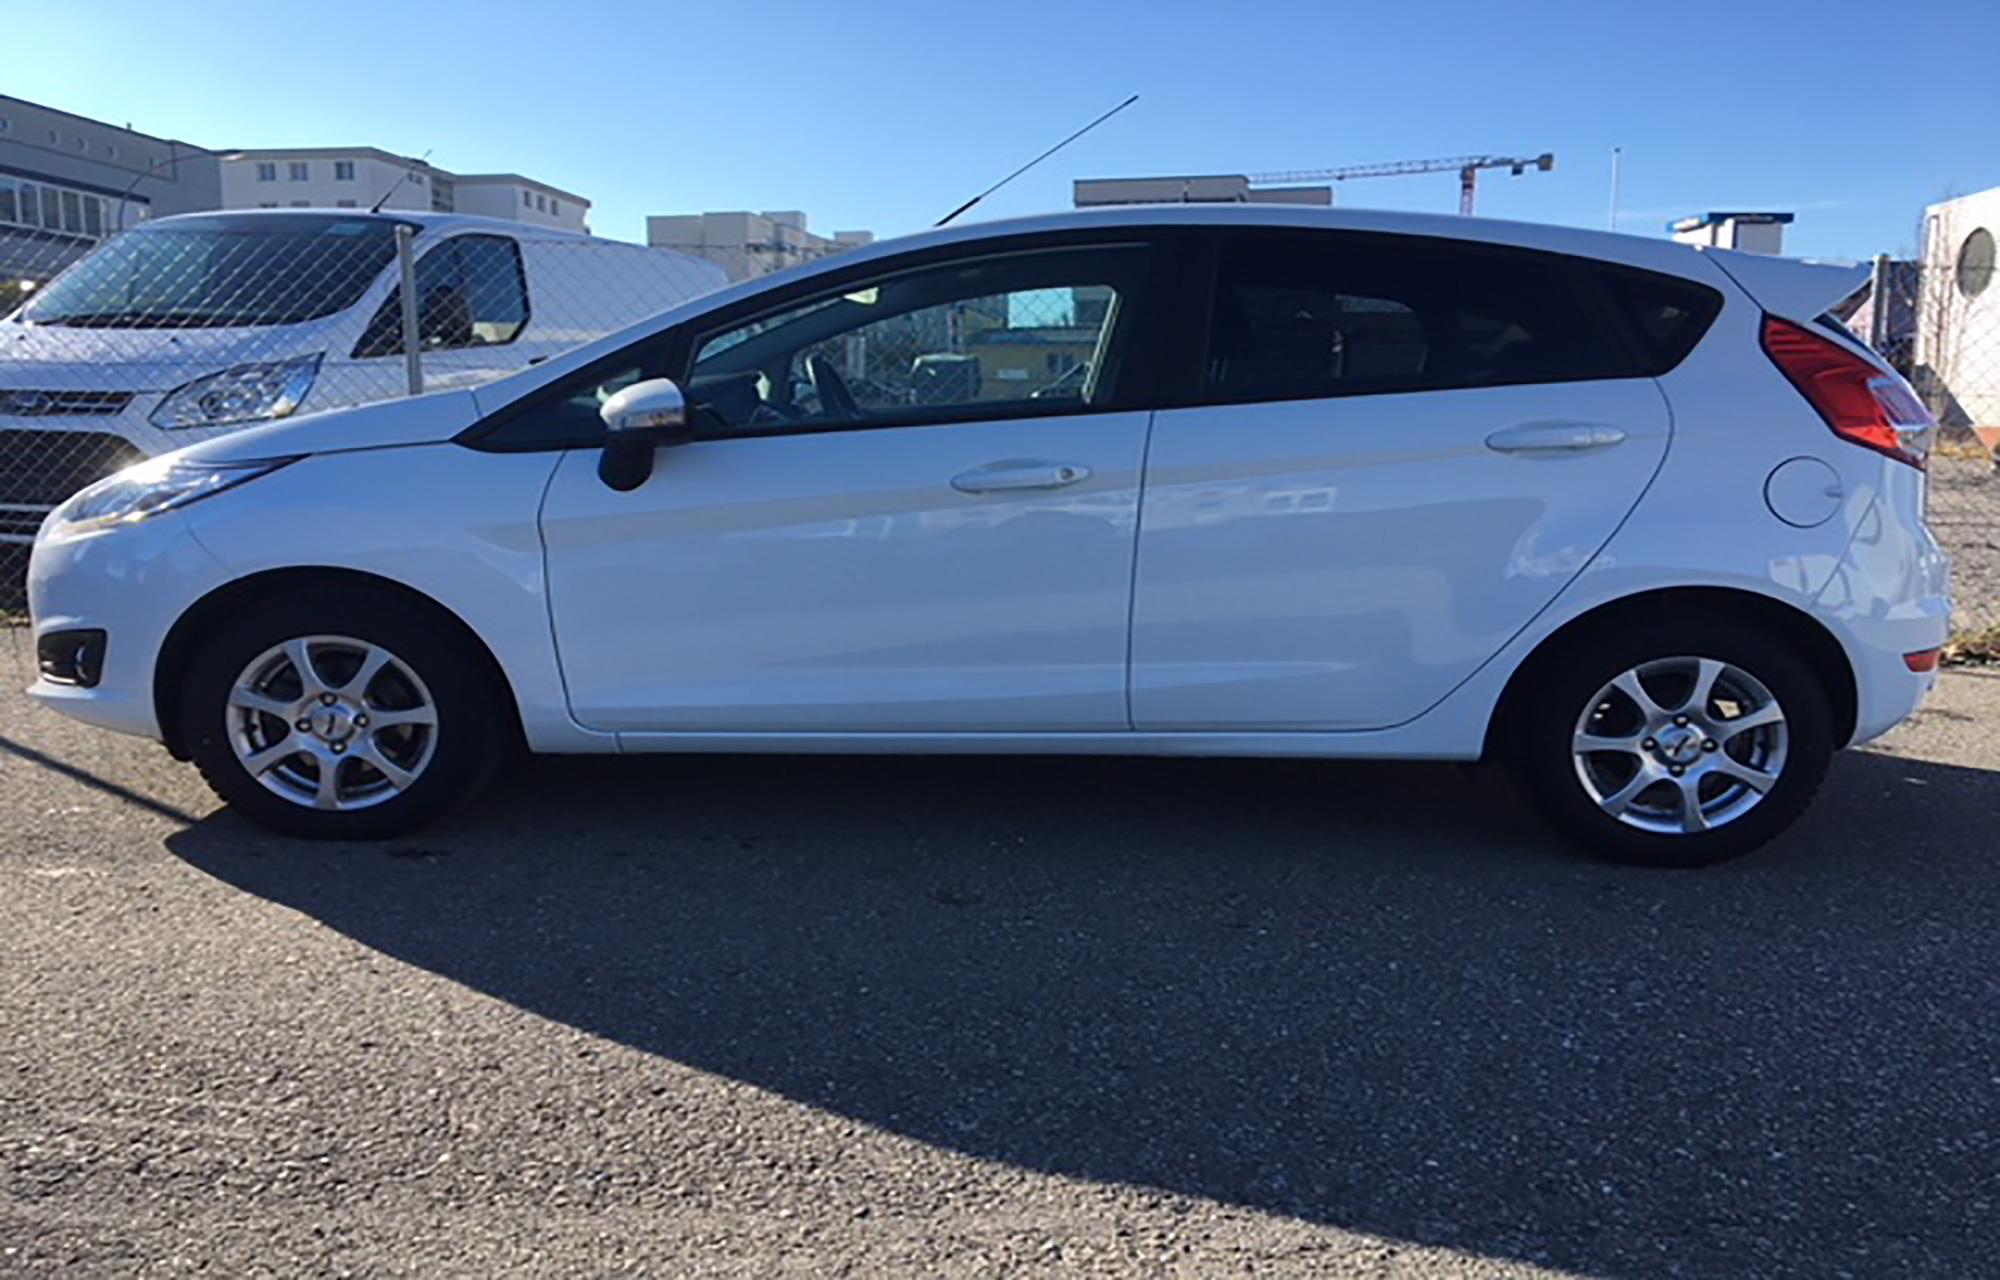 Ford Fiesta manuelle 1.0SCTi - 5 portes / 5 places